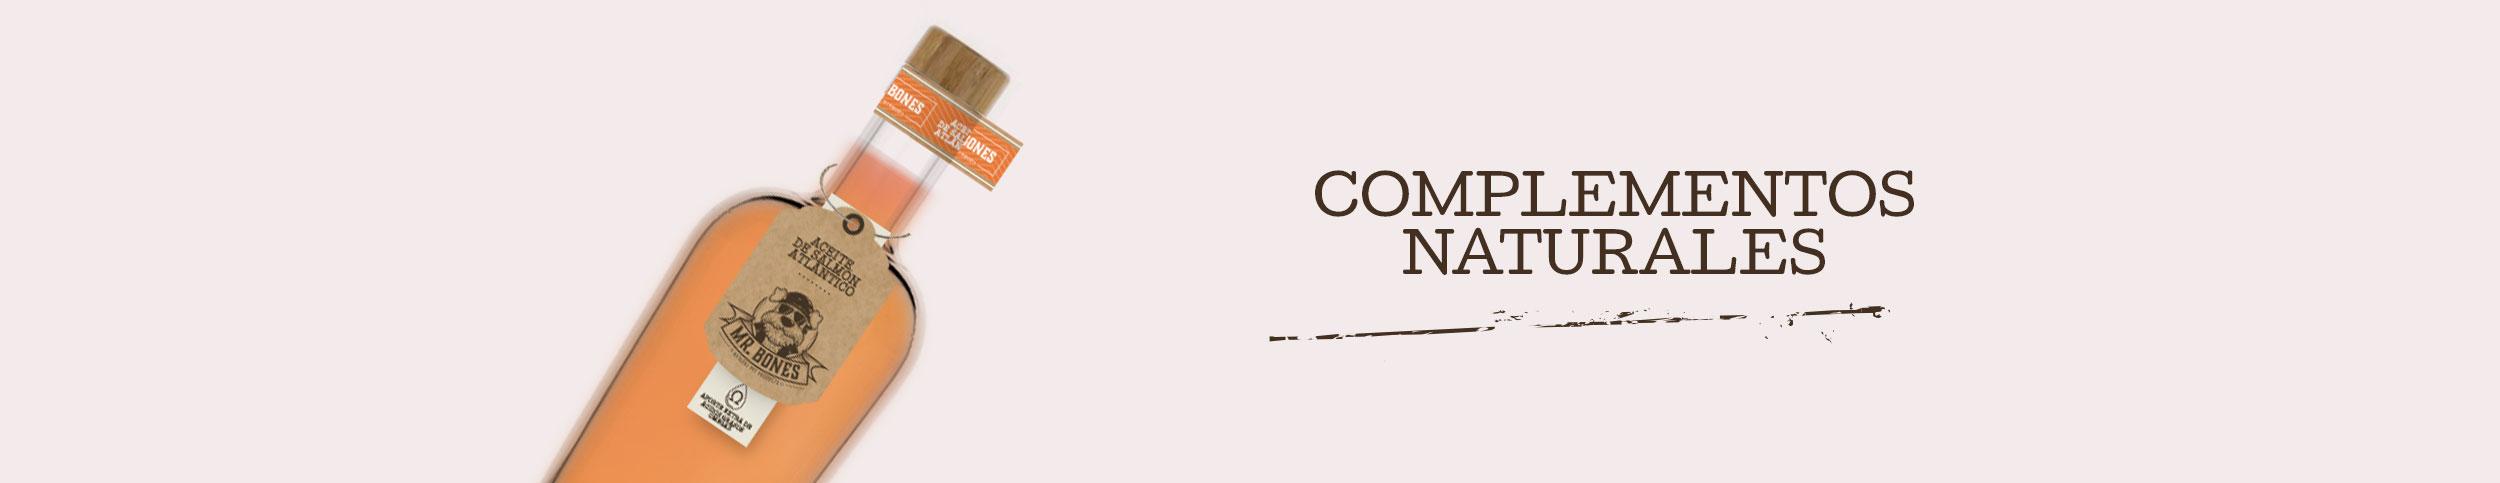 Banner Complementos Naturales